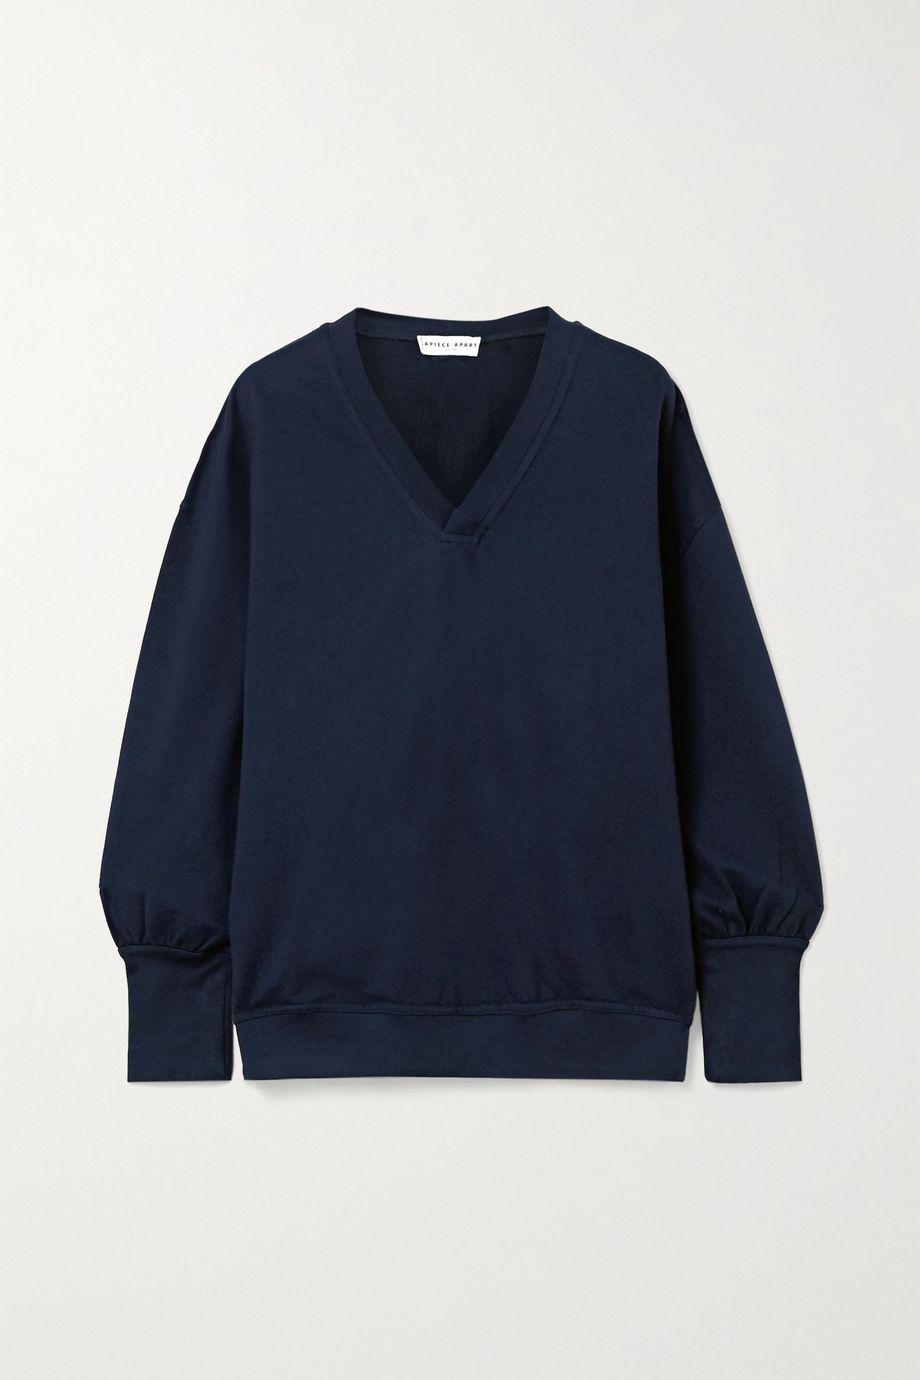 APIECE APART Napoli cotton-jersey sweatshirt